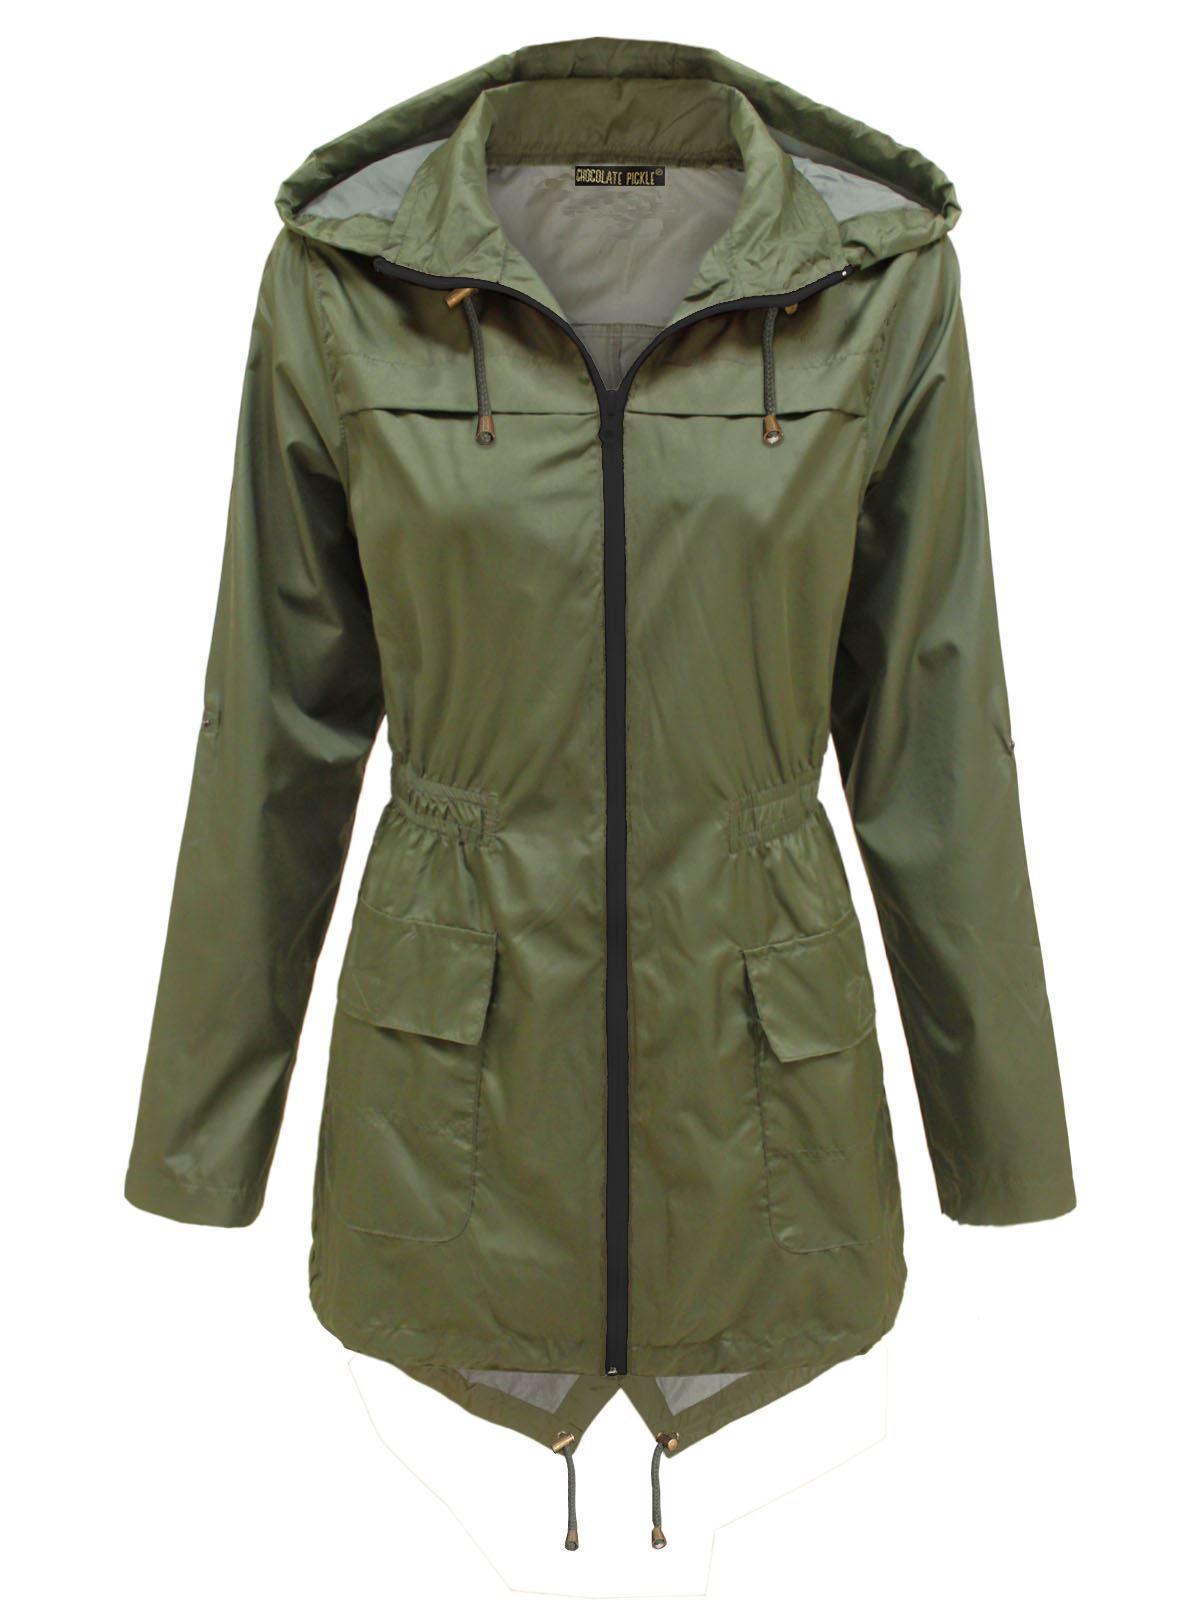 New-Womens-Plus-Size-Contrast-Zip-Waterproof-Raincoats- - New Womens Plus Size Contrast Zip Waterproof Raincoats Fishtail